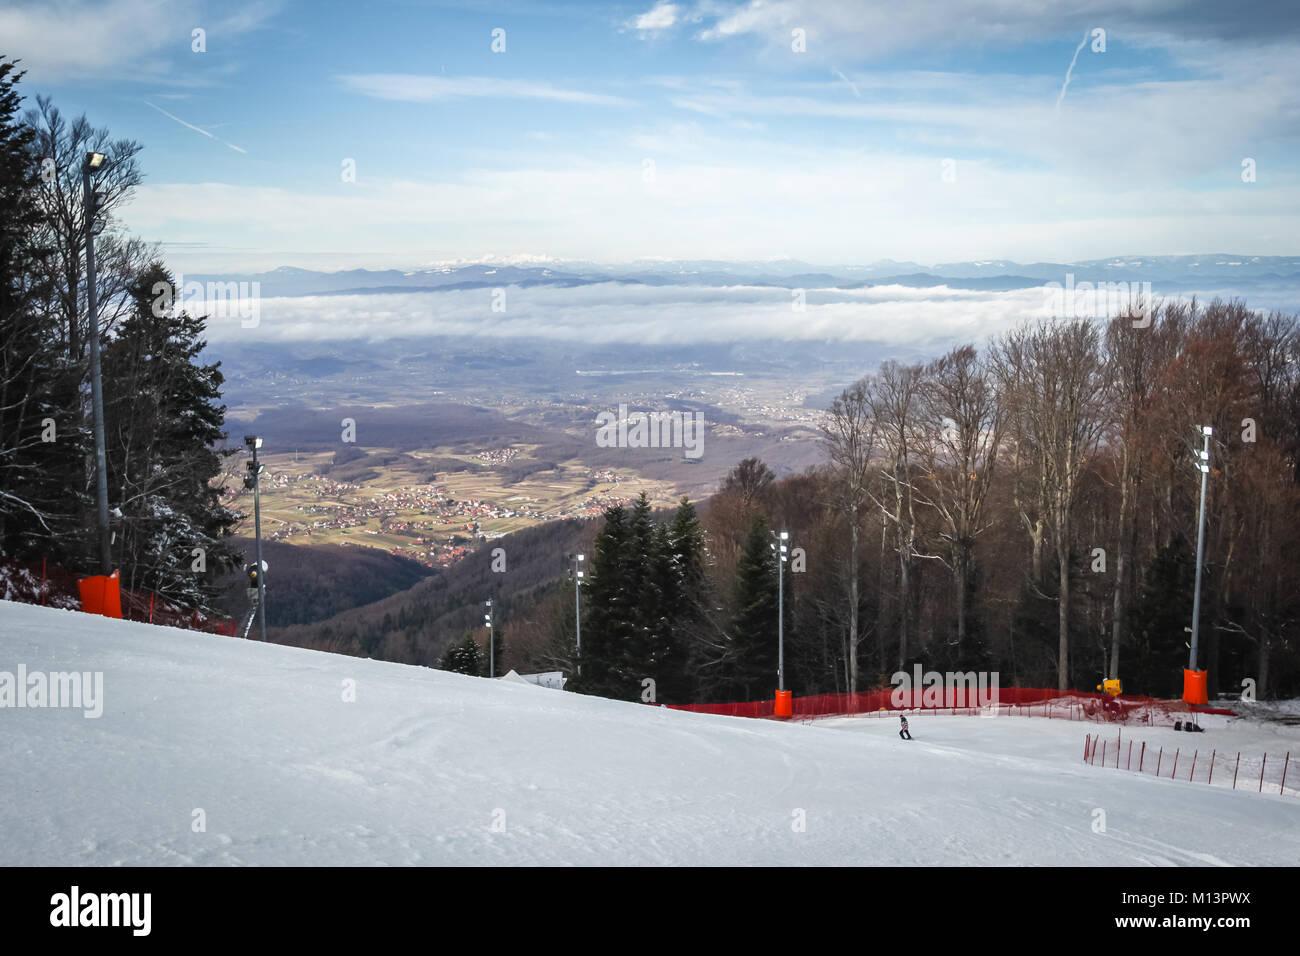 ZAGREB, CROATIA - JANUARY 3, 2018 : Ski run of the Audi FIS Alpine Ski World Cup Women's Slalom, Snow Queen - Stock Image